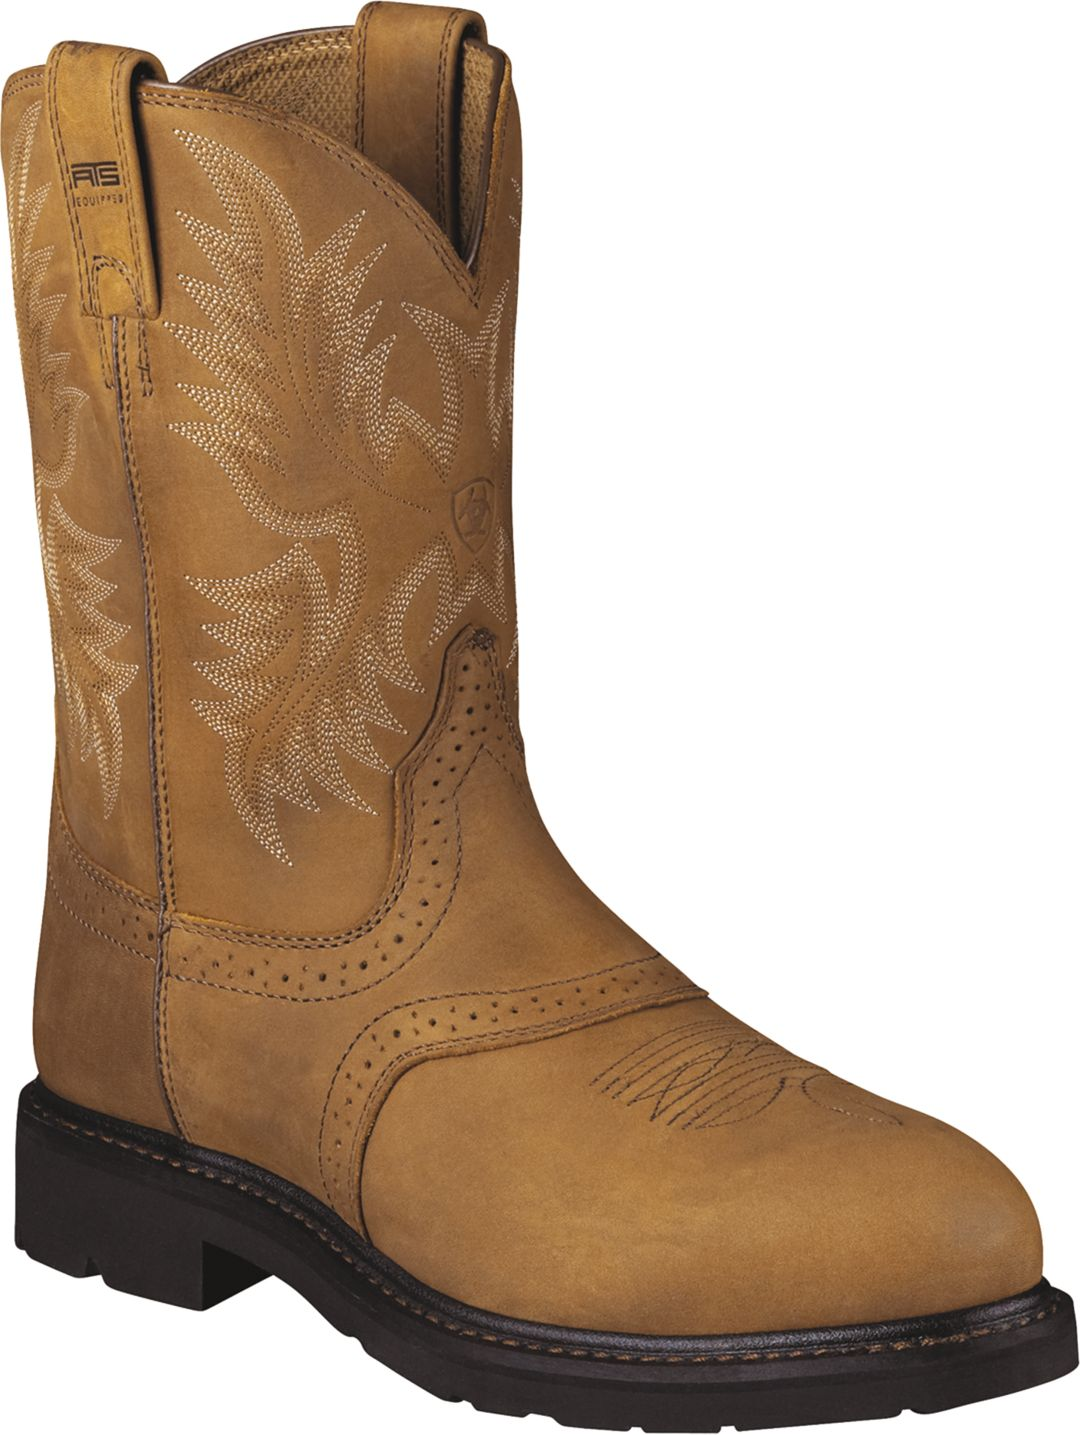 6e42f70e417 Ariat Men's Sierra Saddle Steel Toe Western Work Boots | DICK'S ...